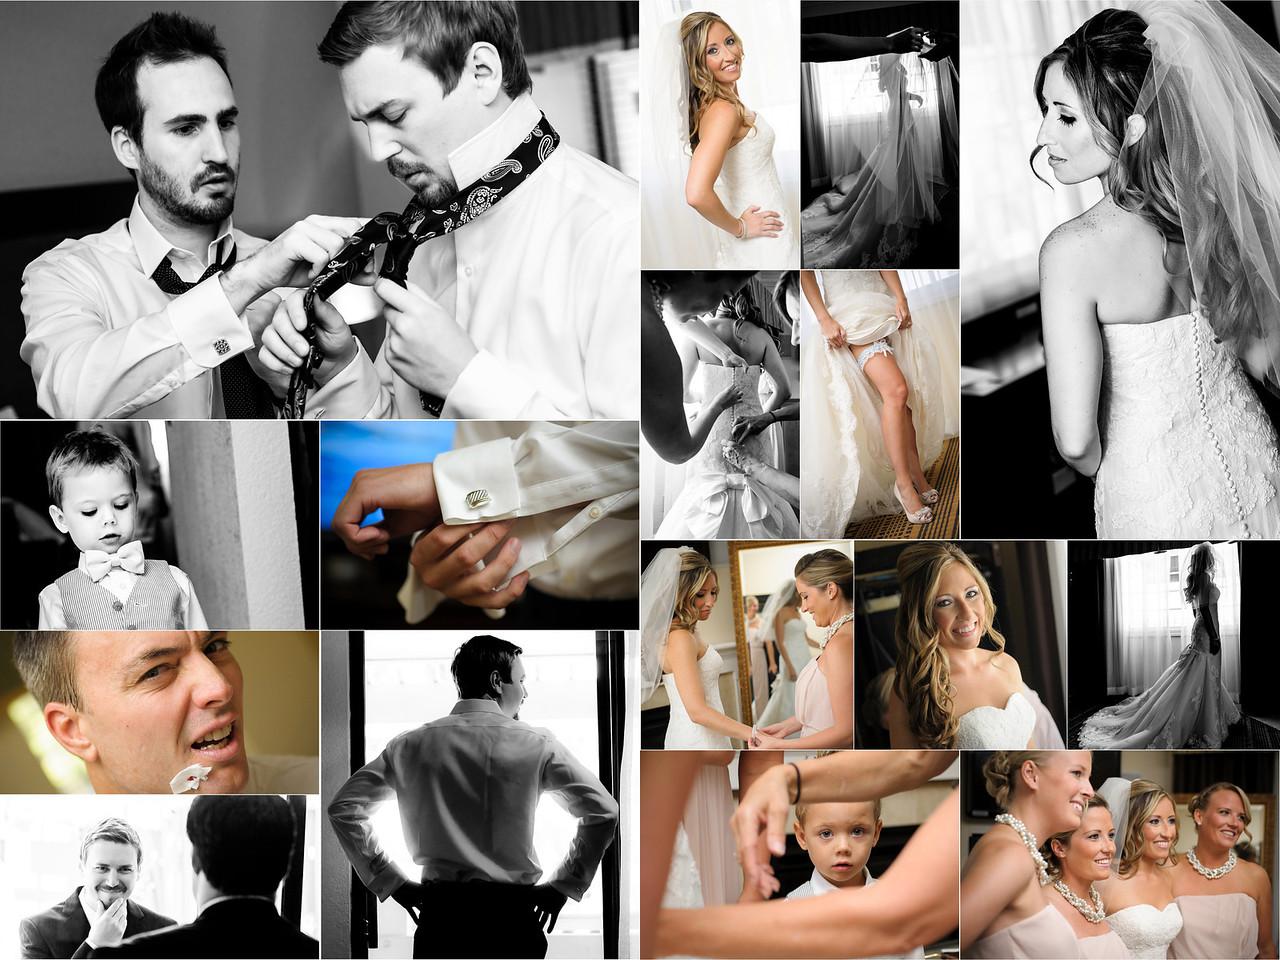 Erica_and_Justin_Byington_Winery_Los_Gatos_Wedding_Photography_4x6_Photo_Board_02